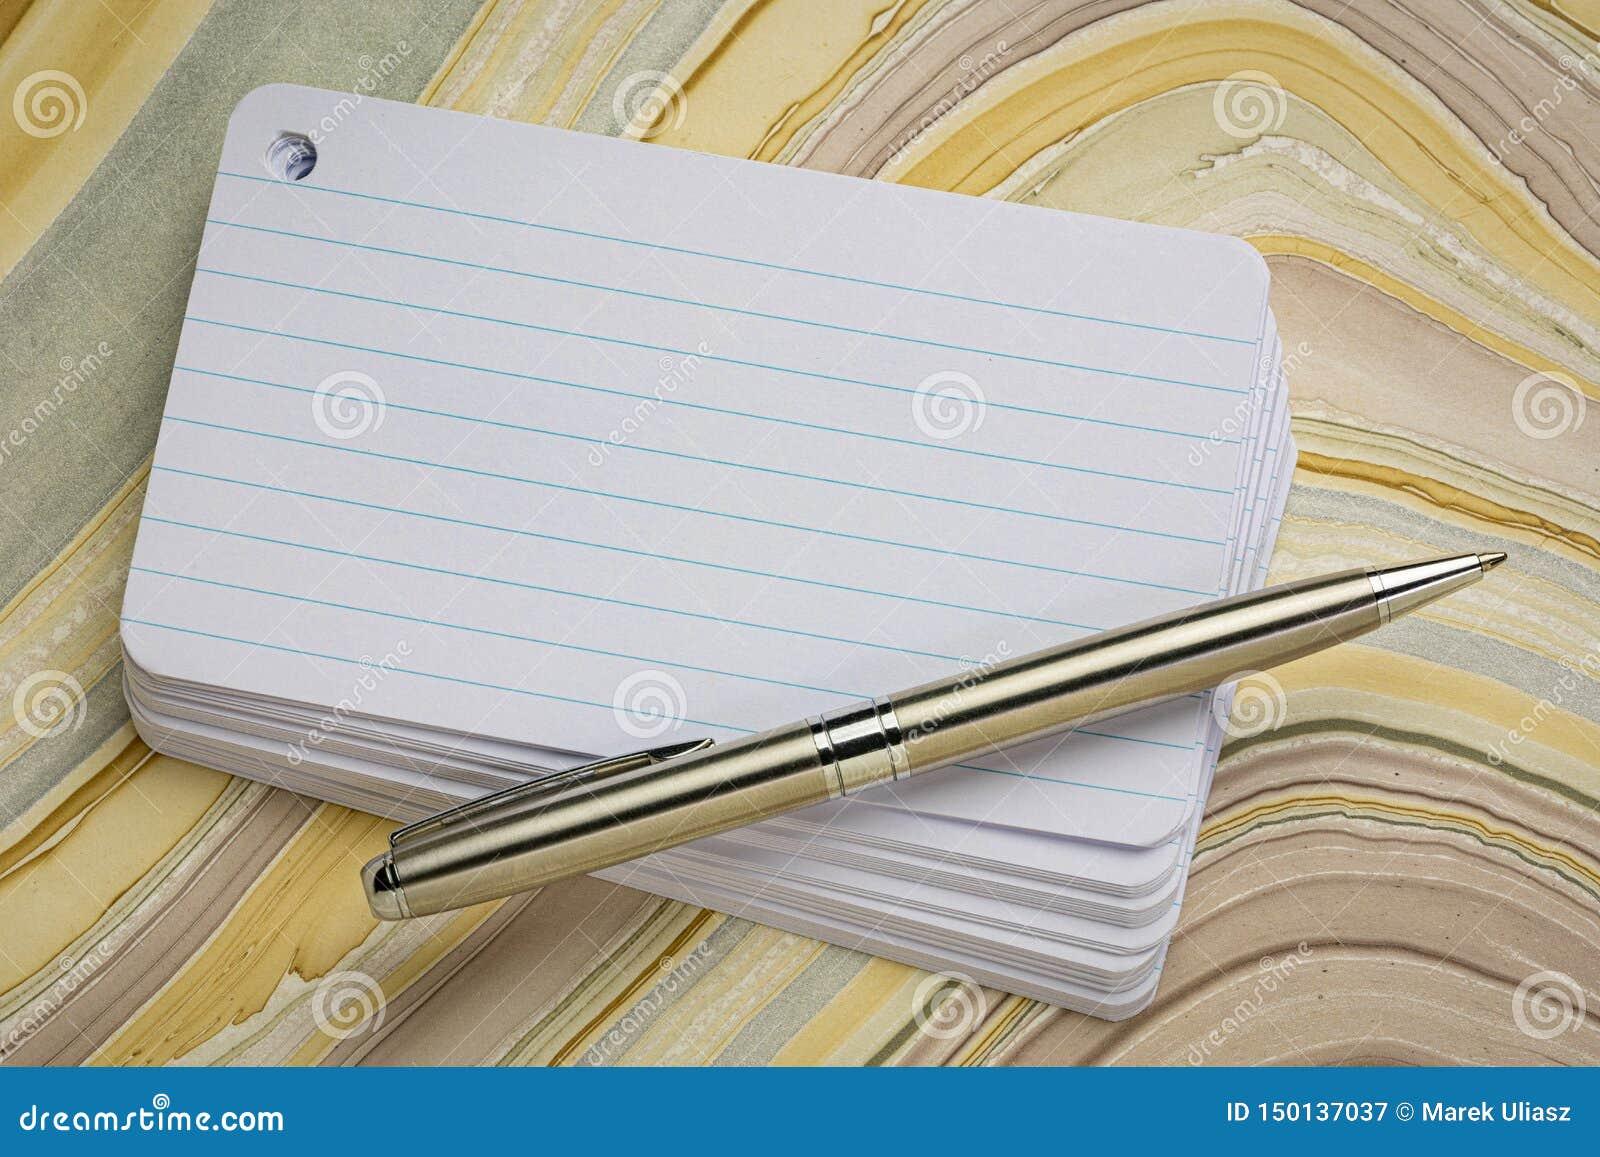 stack of blank index card stock illustration illustration